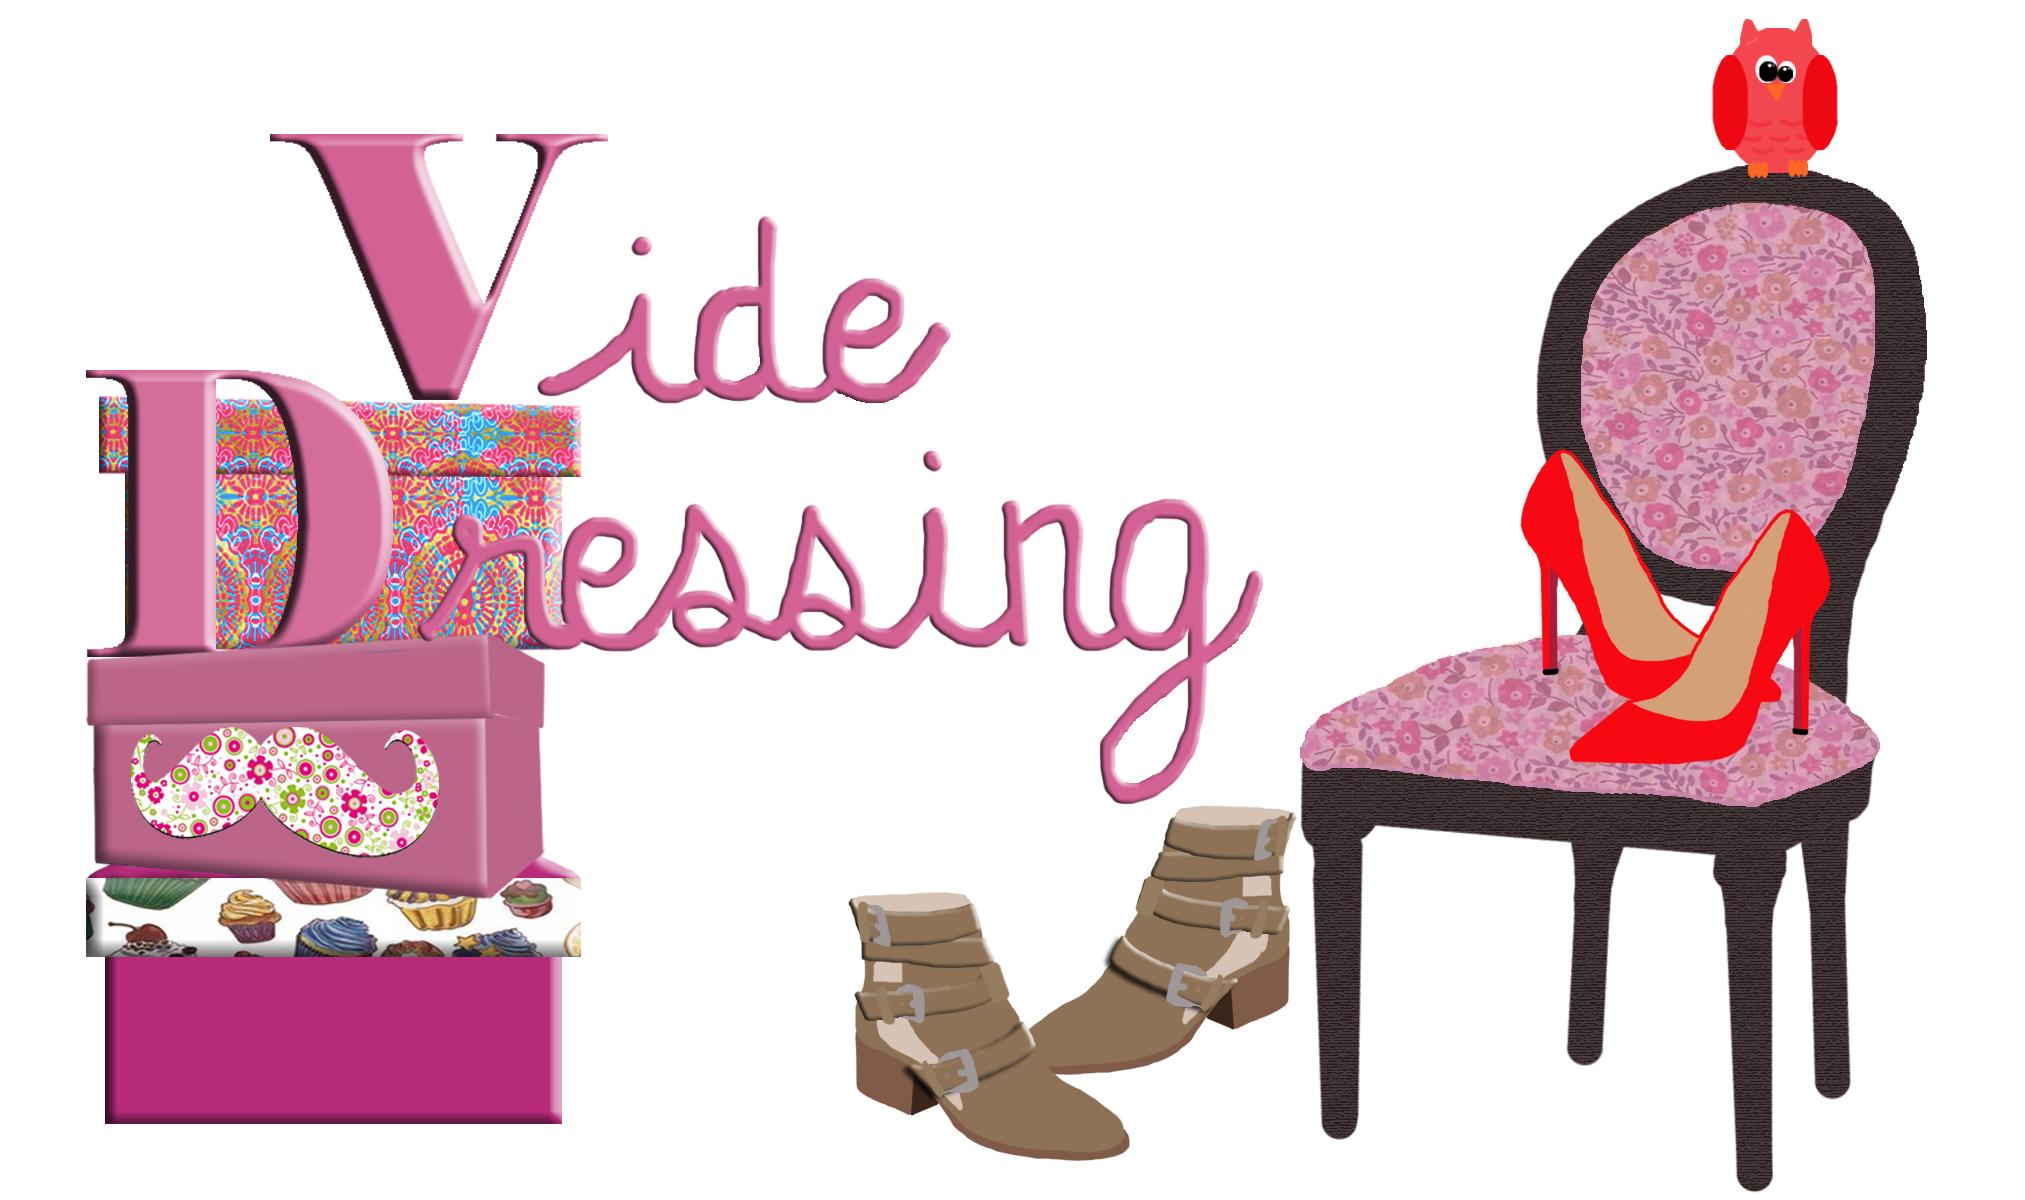 vid dressing